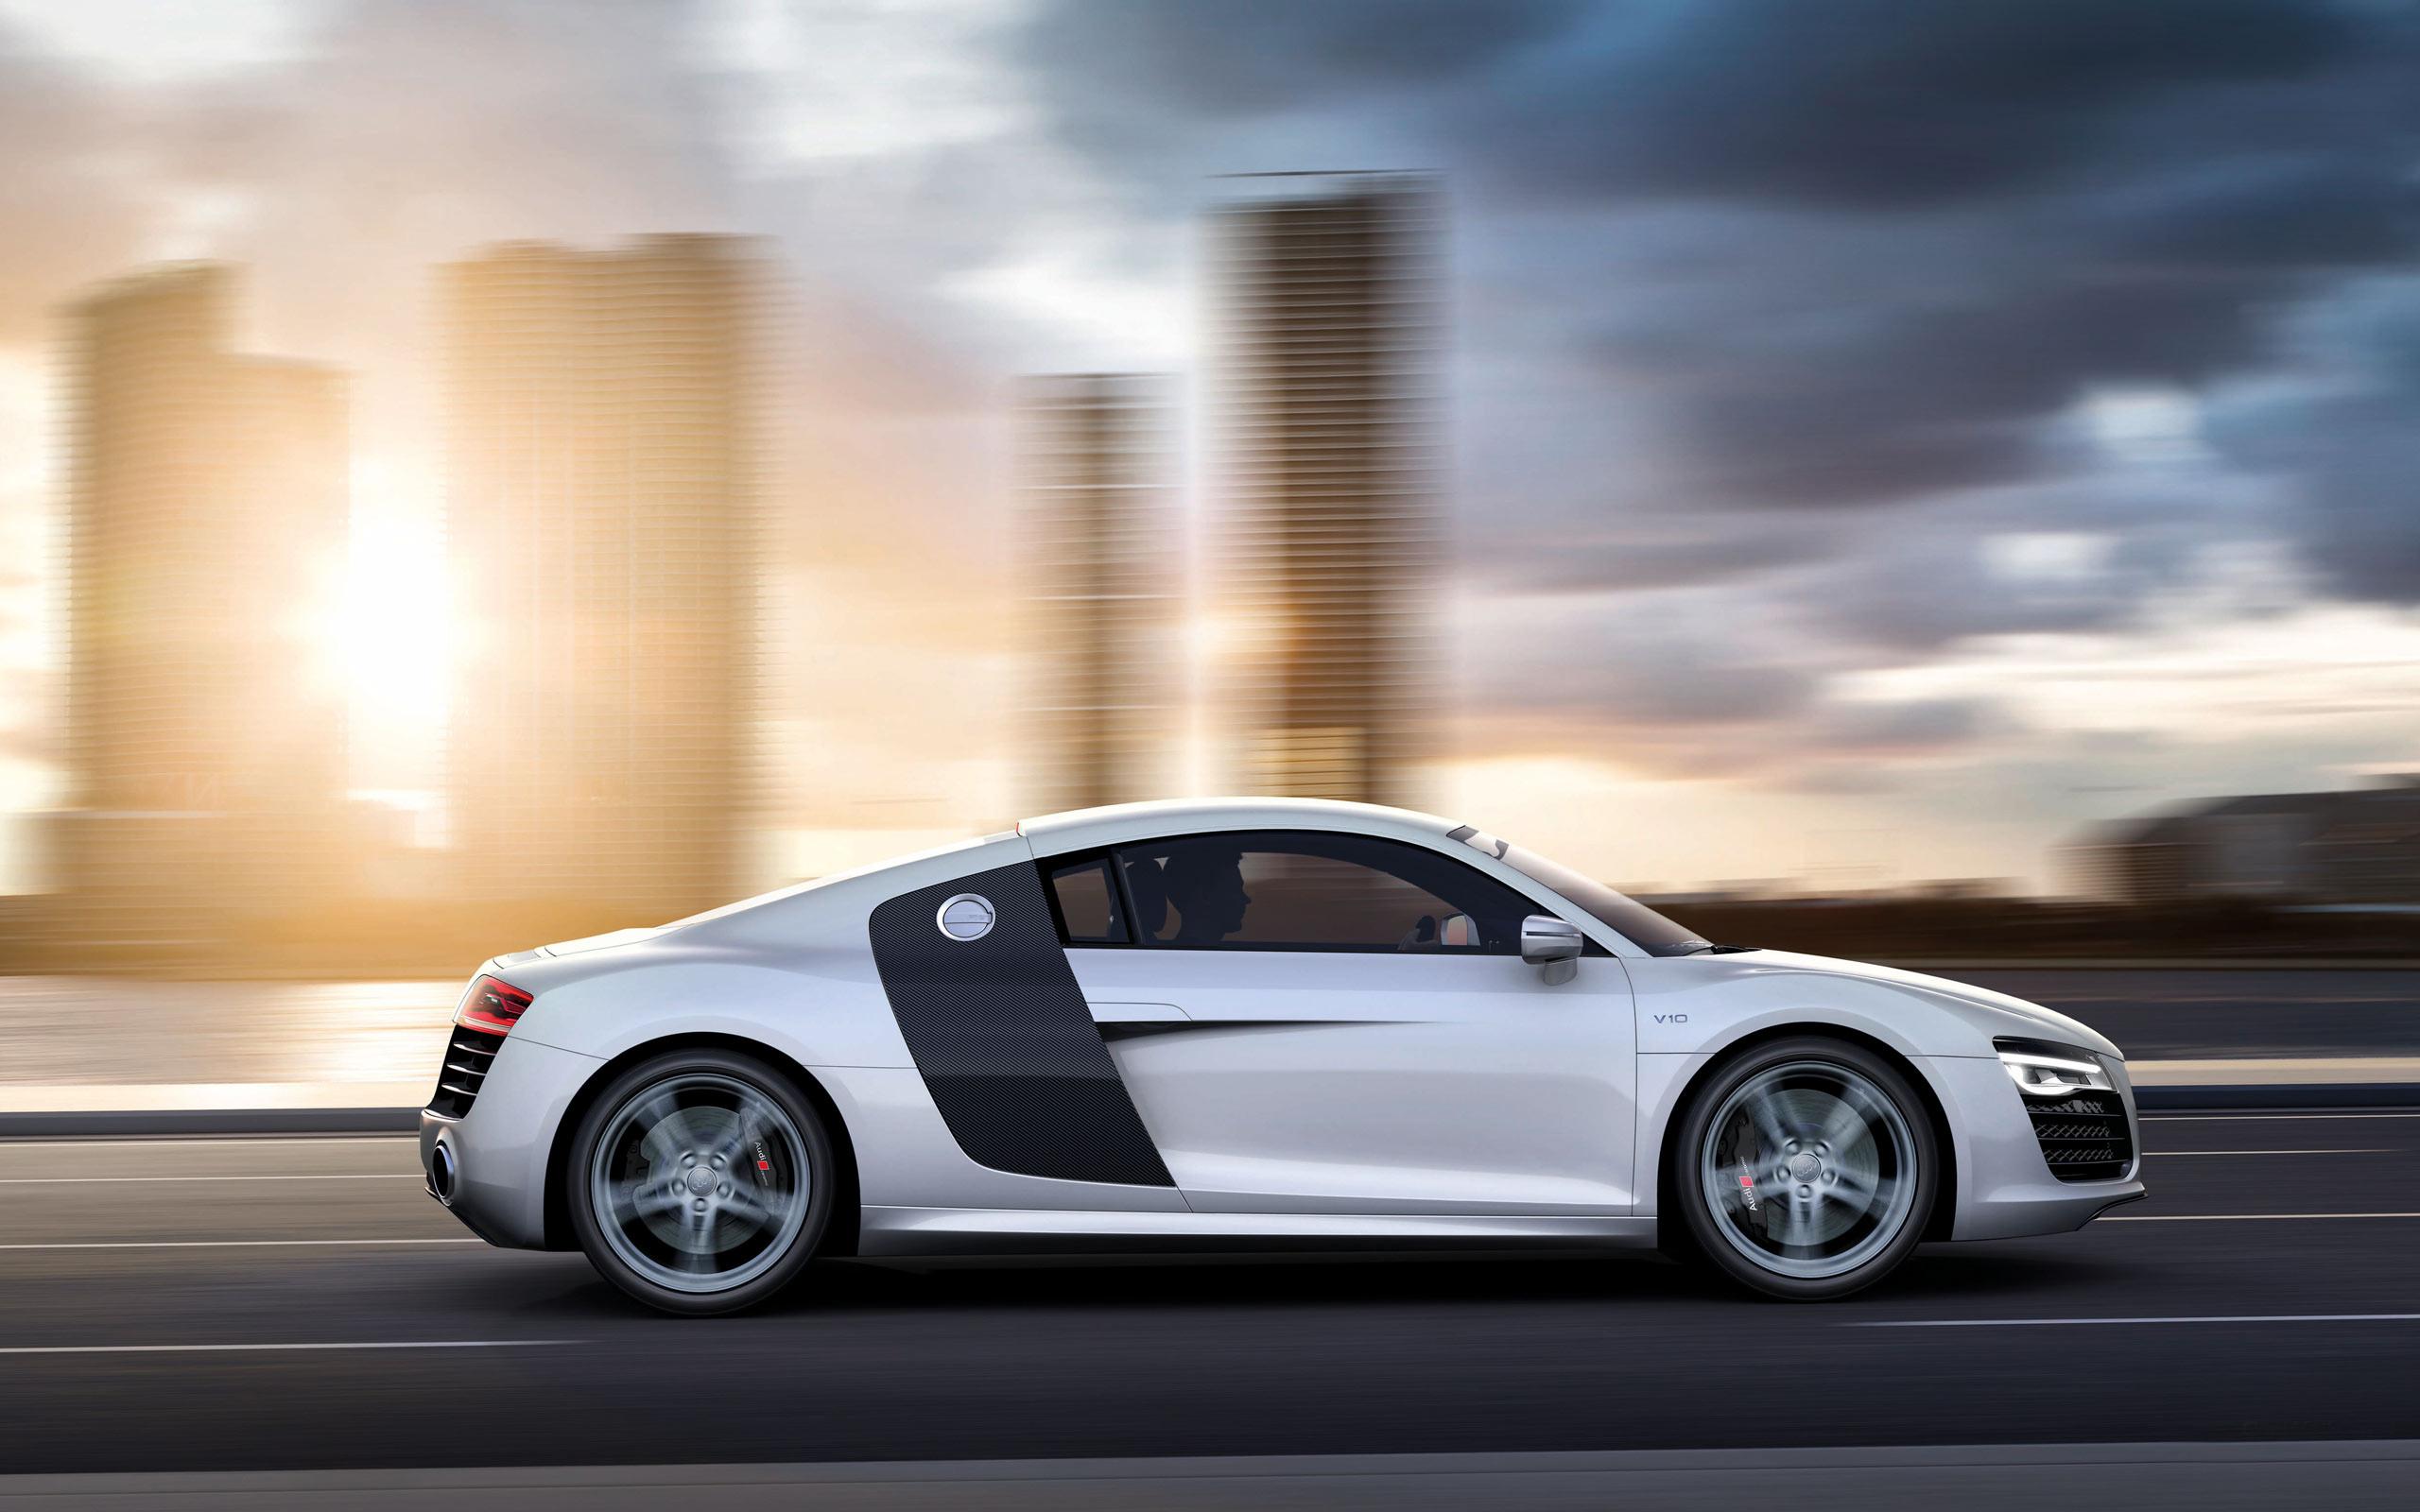 Cool Audi R8 Animated Wallpaper | Audi Automotive Design